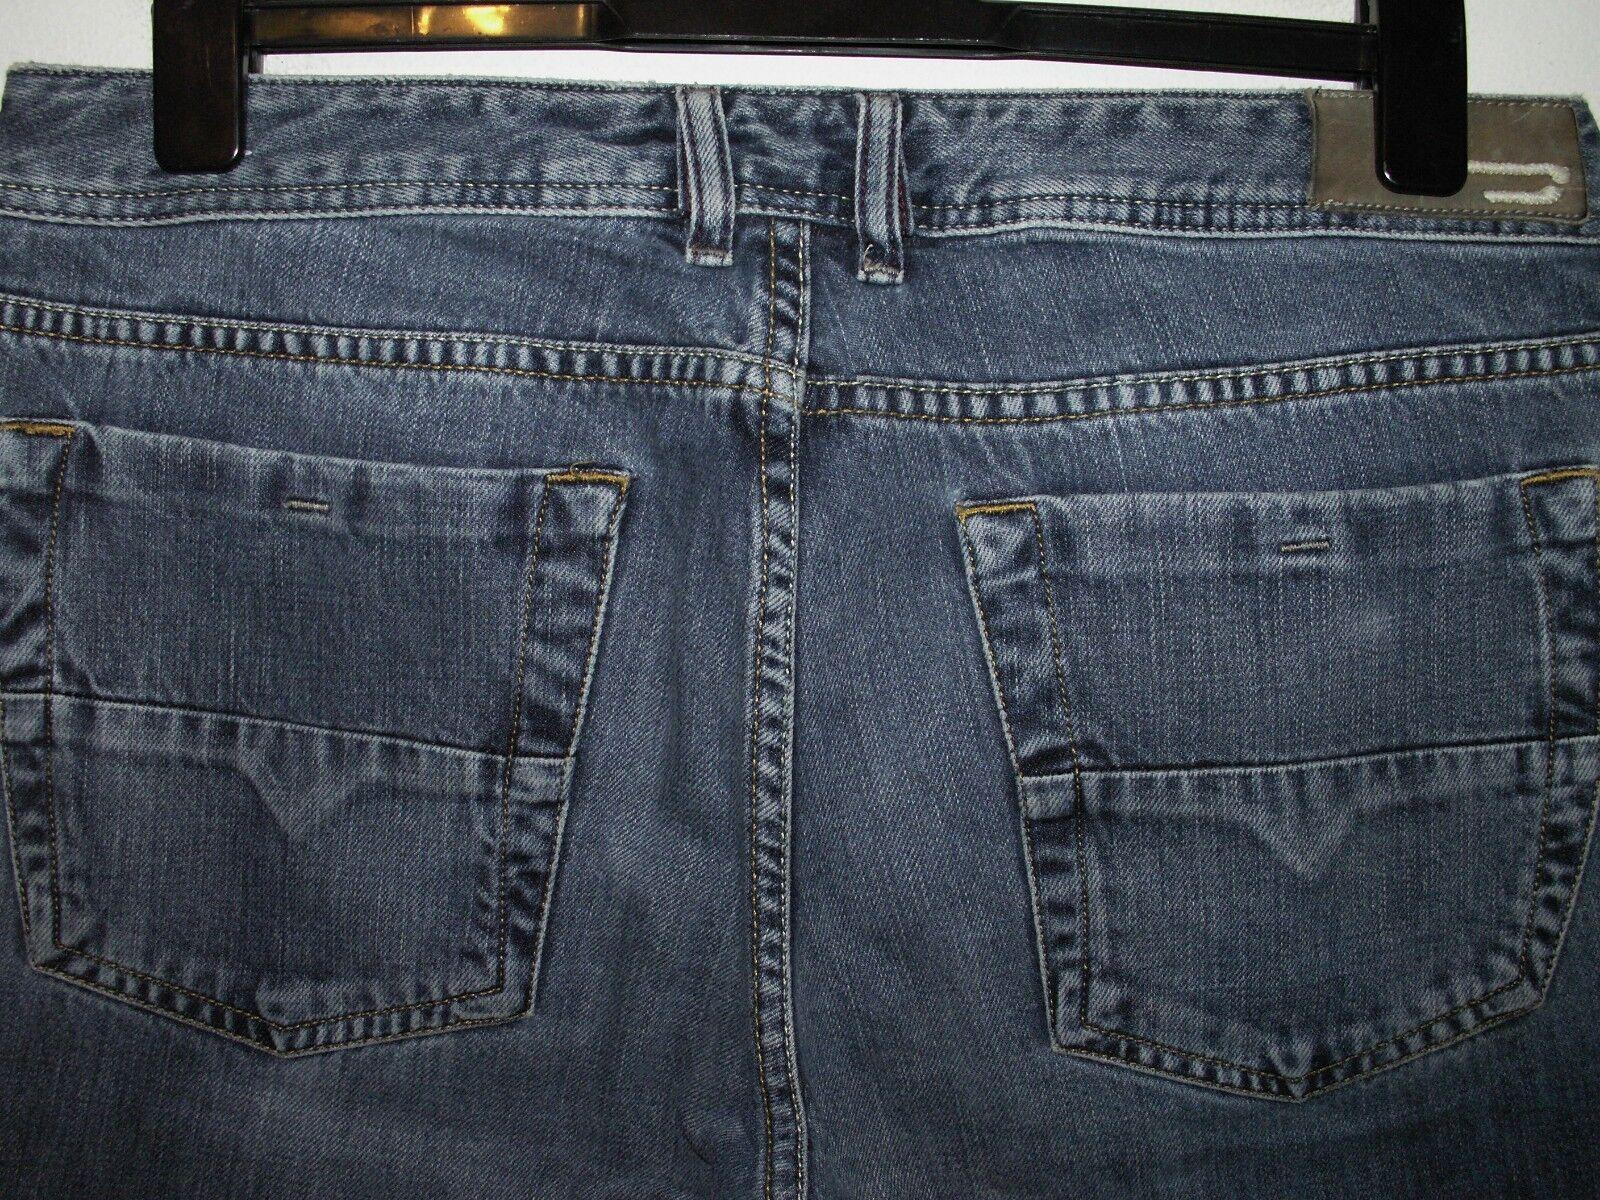 394baf4e Diesel zathan bootcut jeans wash 00701 W34 L34 (a1993) oblnlx1973 ...